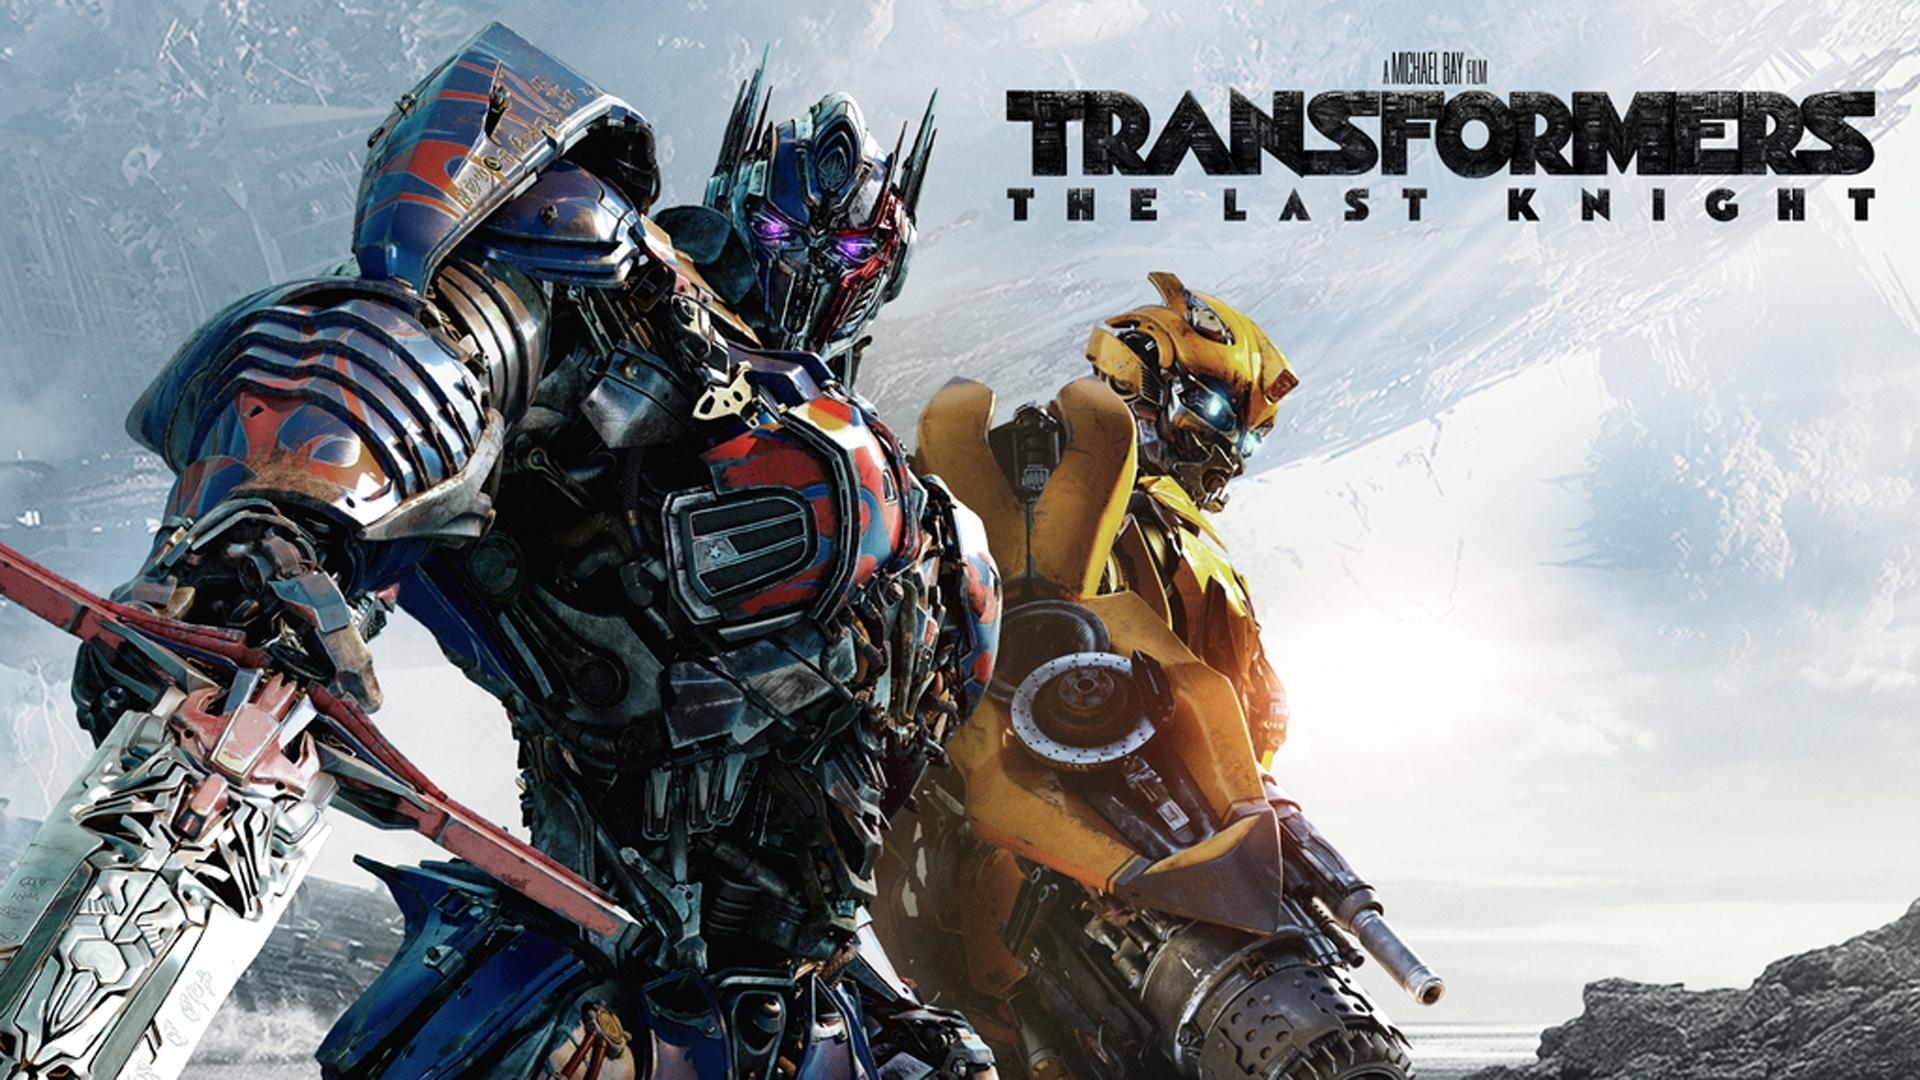 Transformers: The Last Knight ทรานส์ฟอร์เมอร์ส : อัศวินรุ่นสุดท้าย